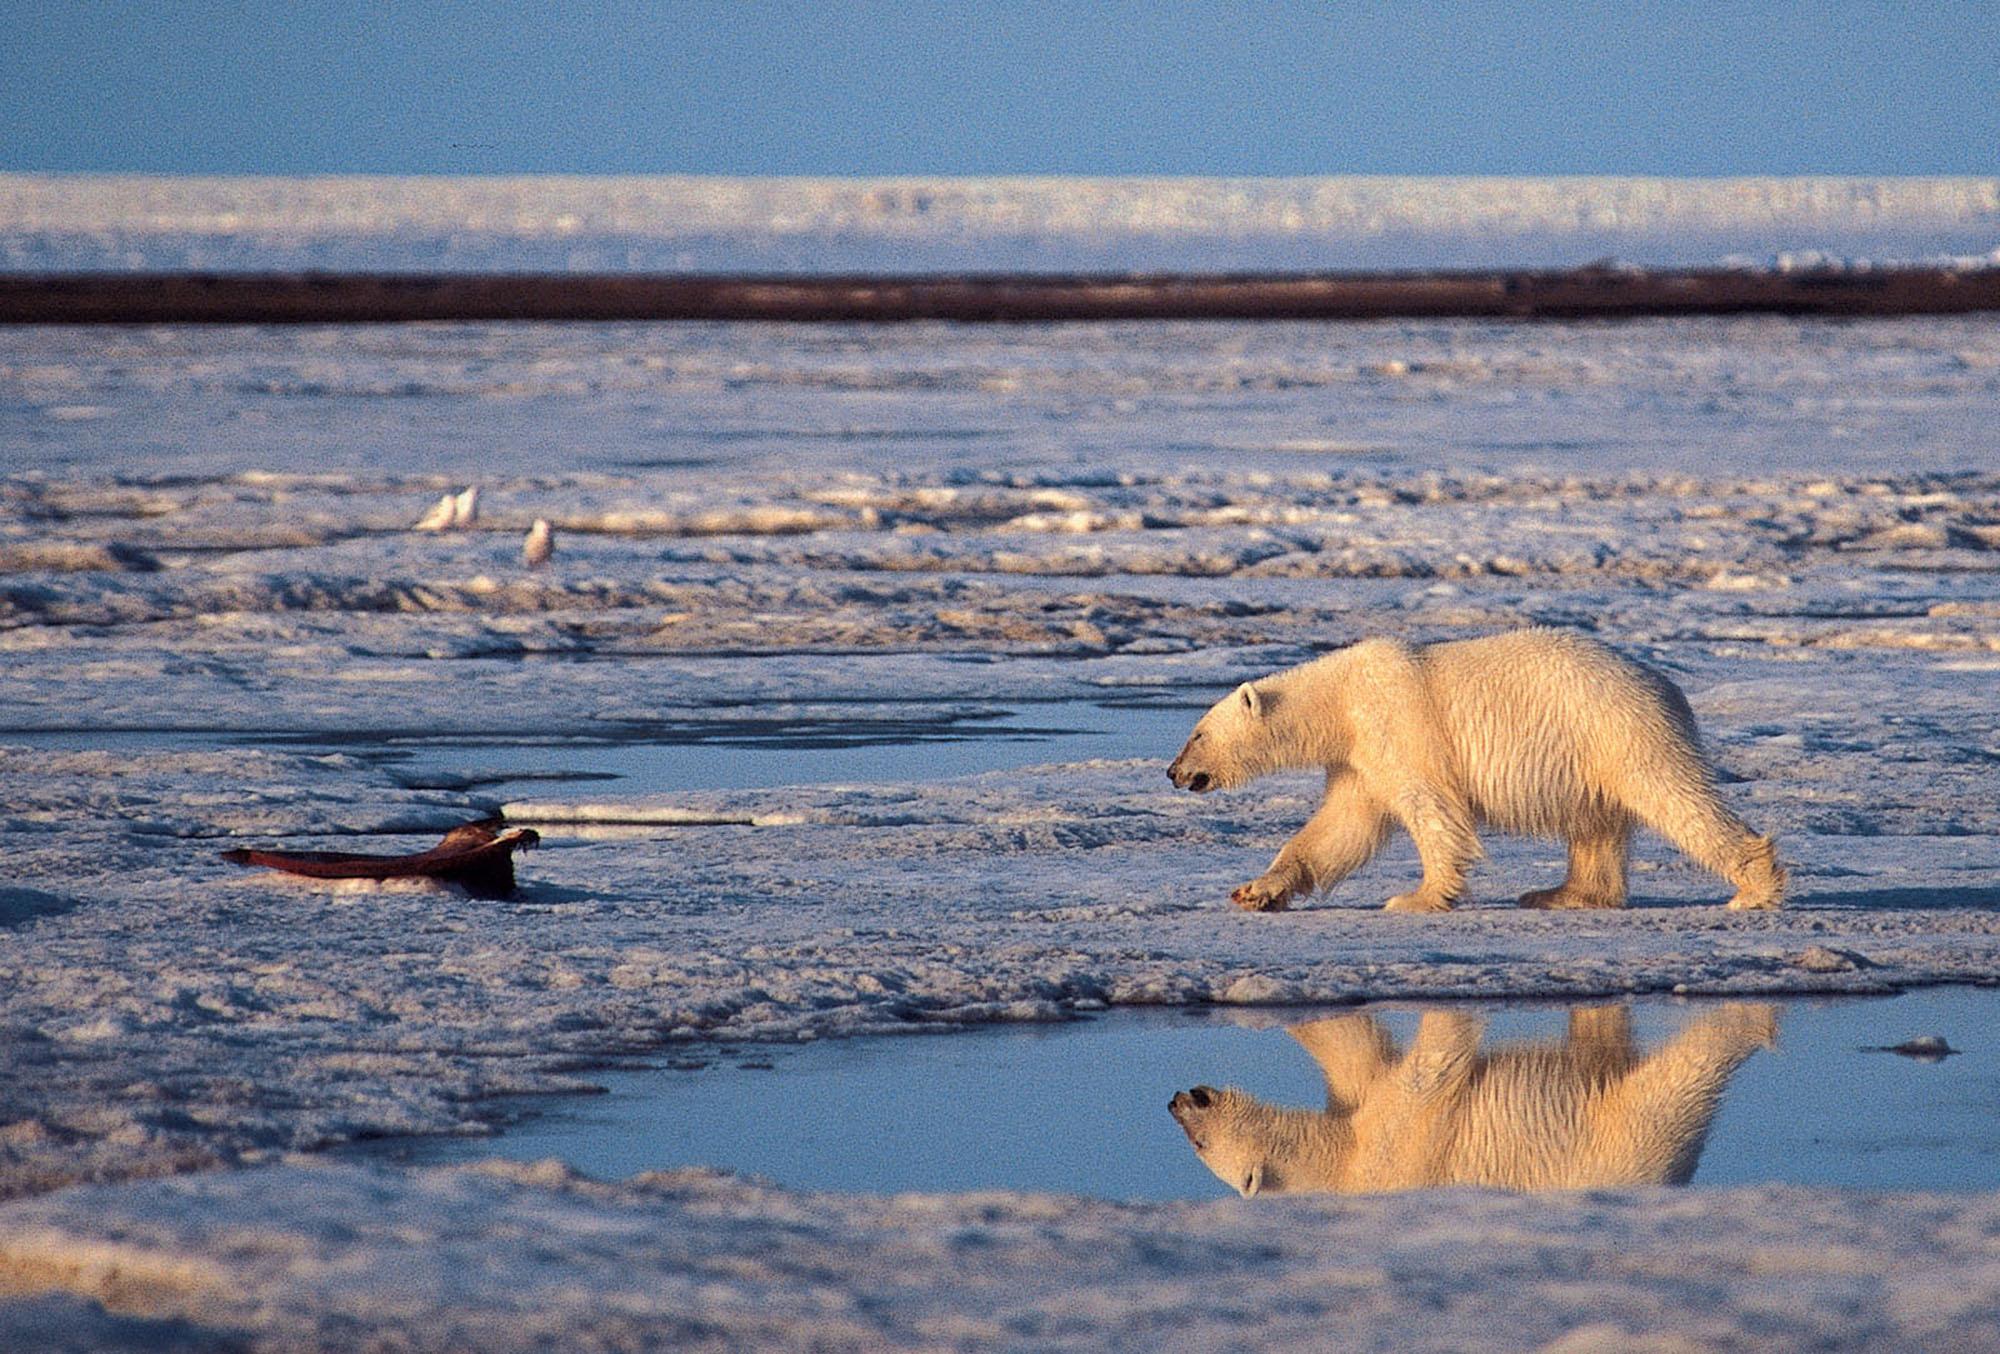 A polar bear walking in the Arctic National Wildlife Refuge in Alaska in 2003.